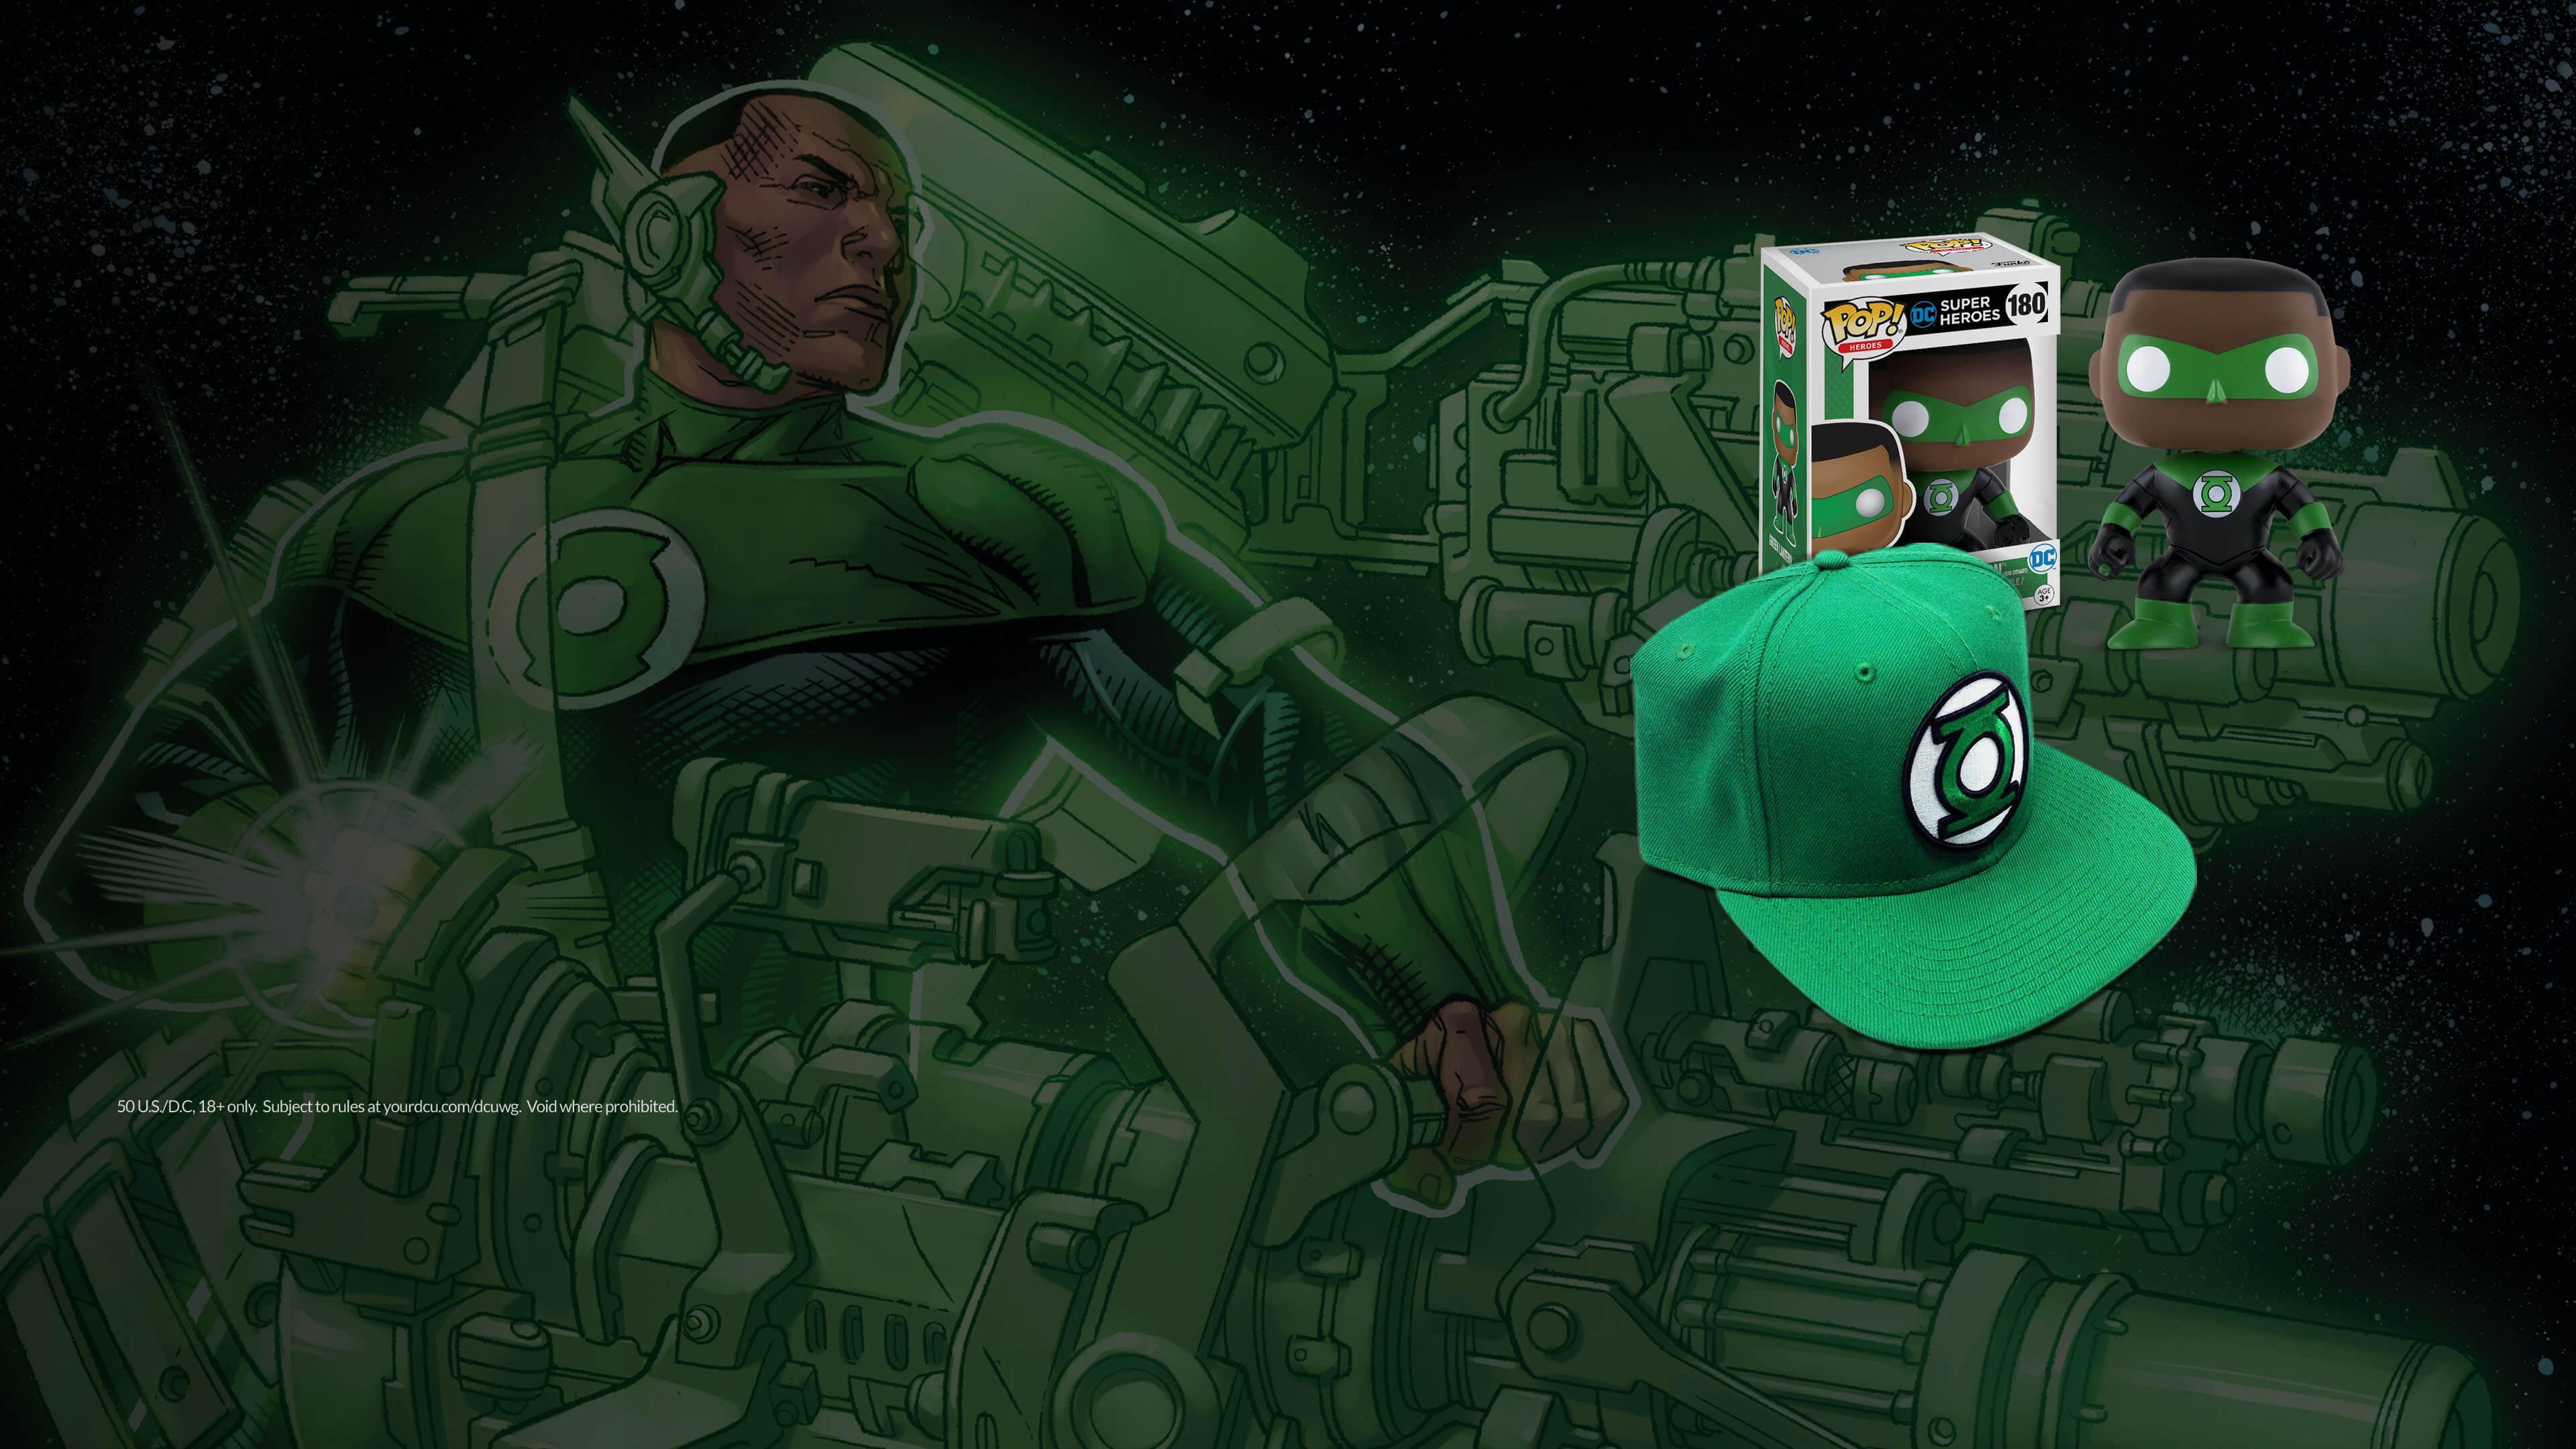 Green Lantern-dcu-ss-020819-v1-singleverr.jpg